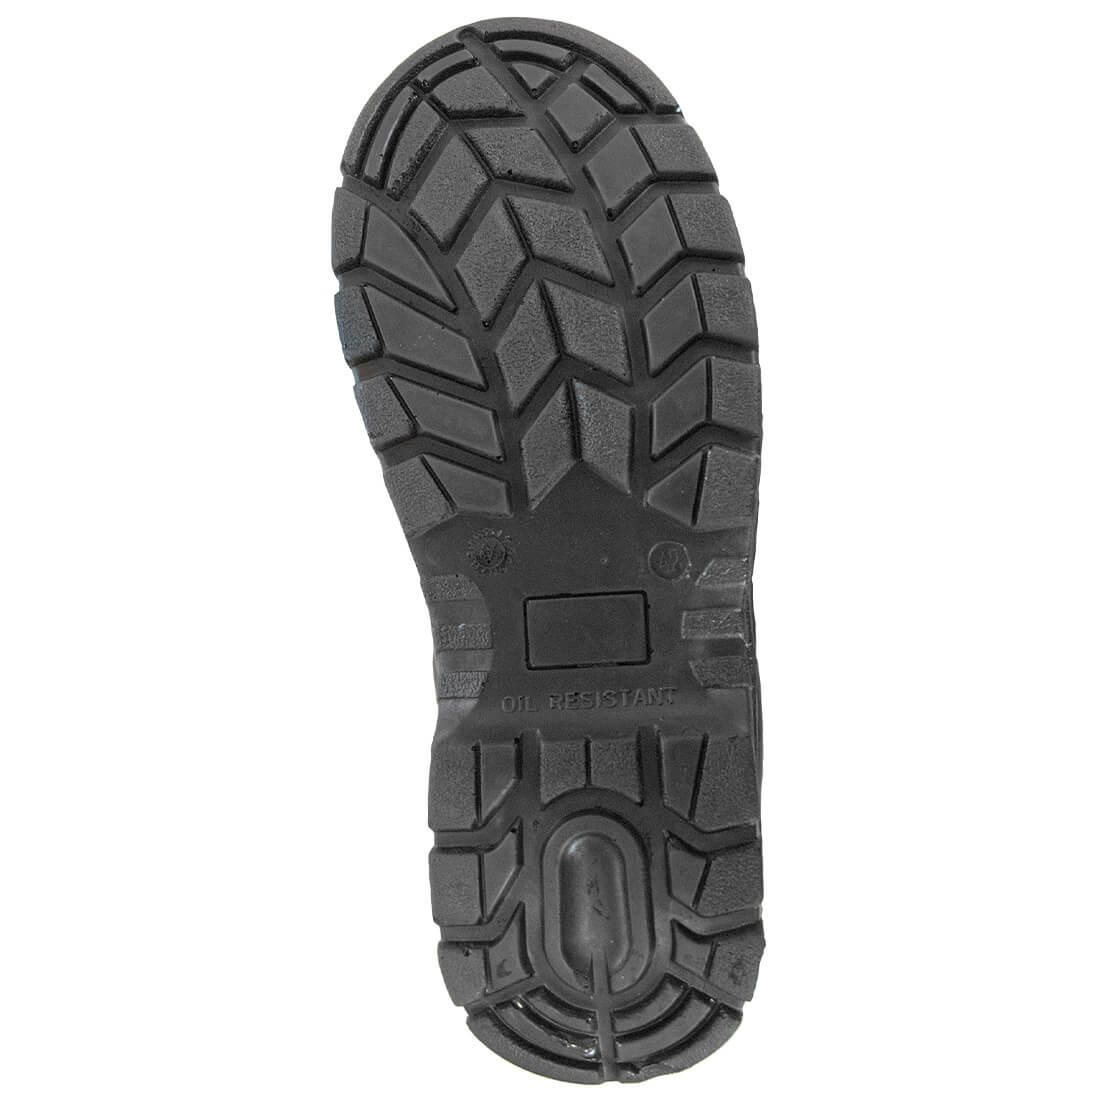 Pantof de Protectie Compositelite™ S1P - Incaltaminte de protectie